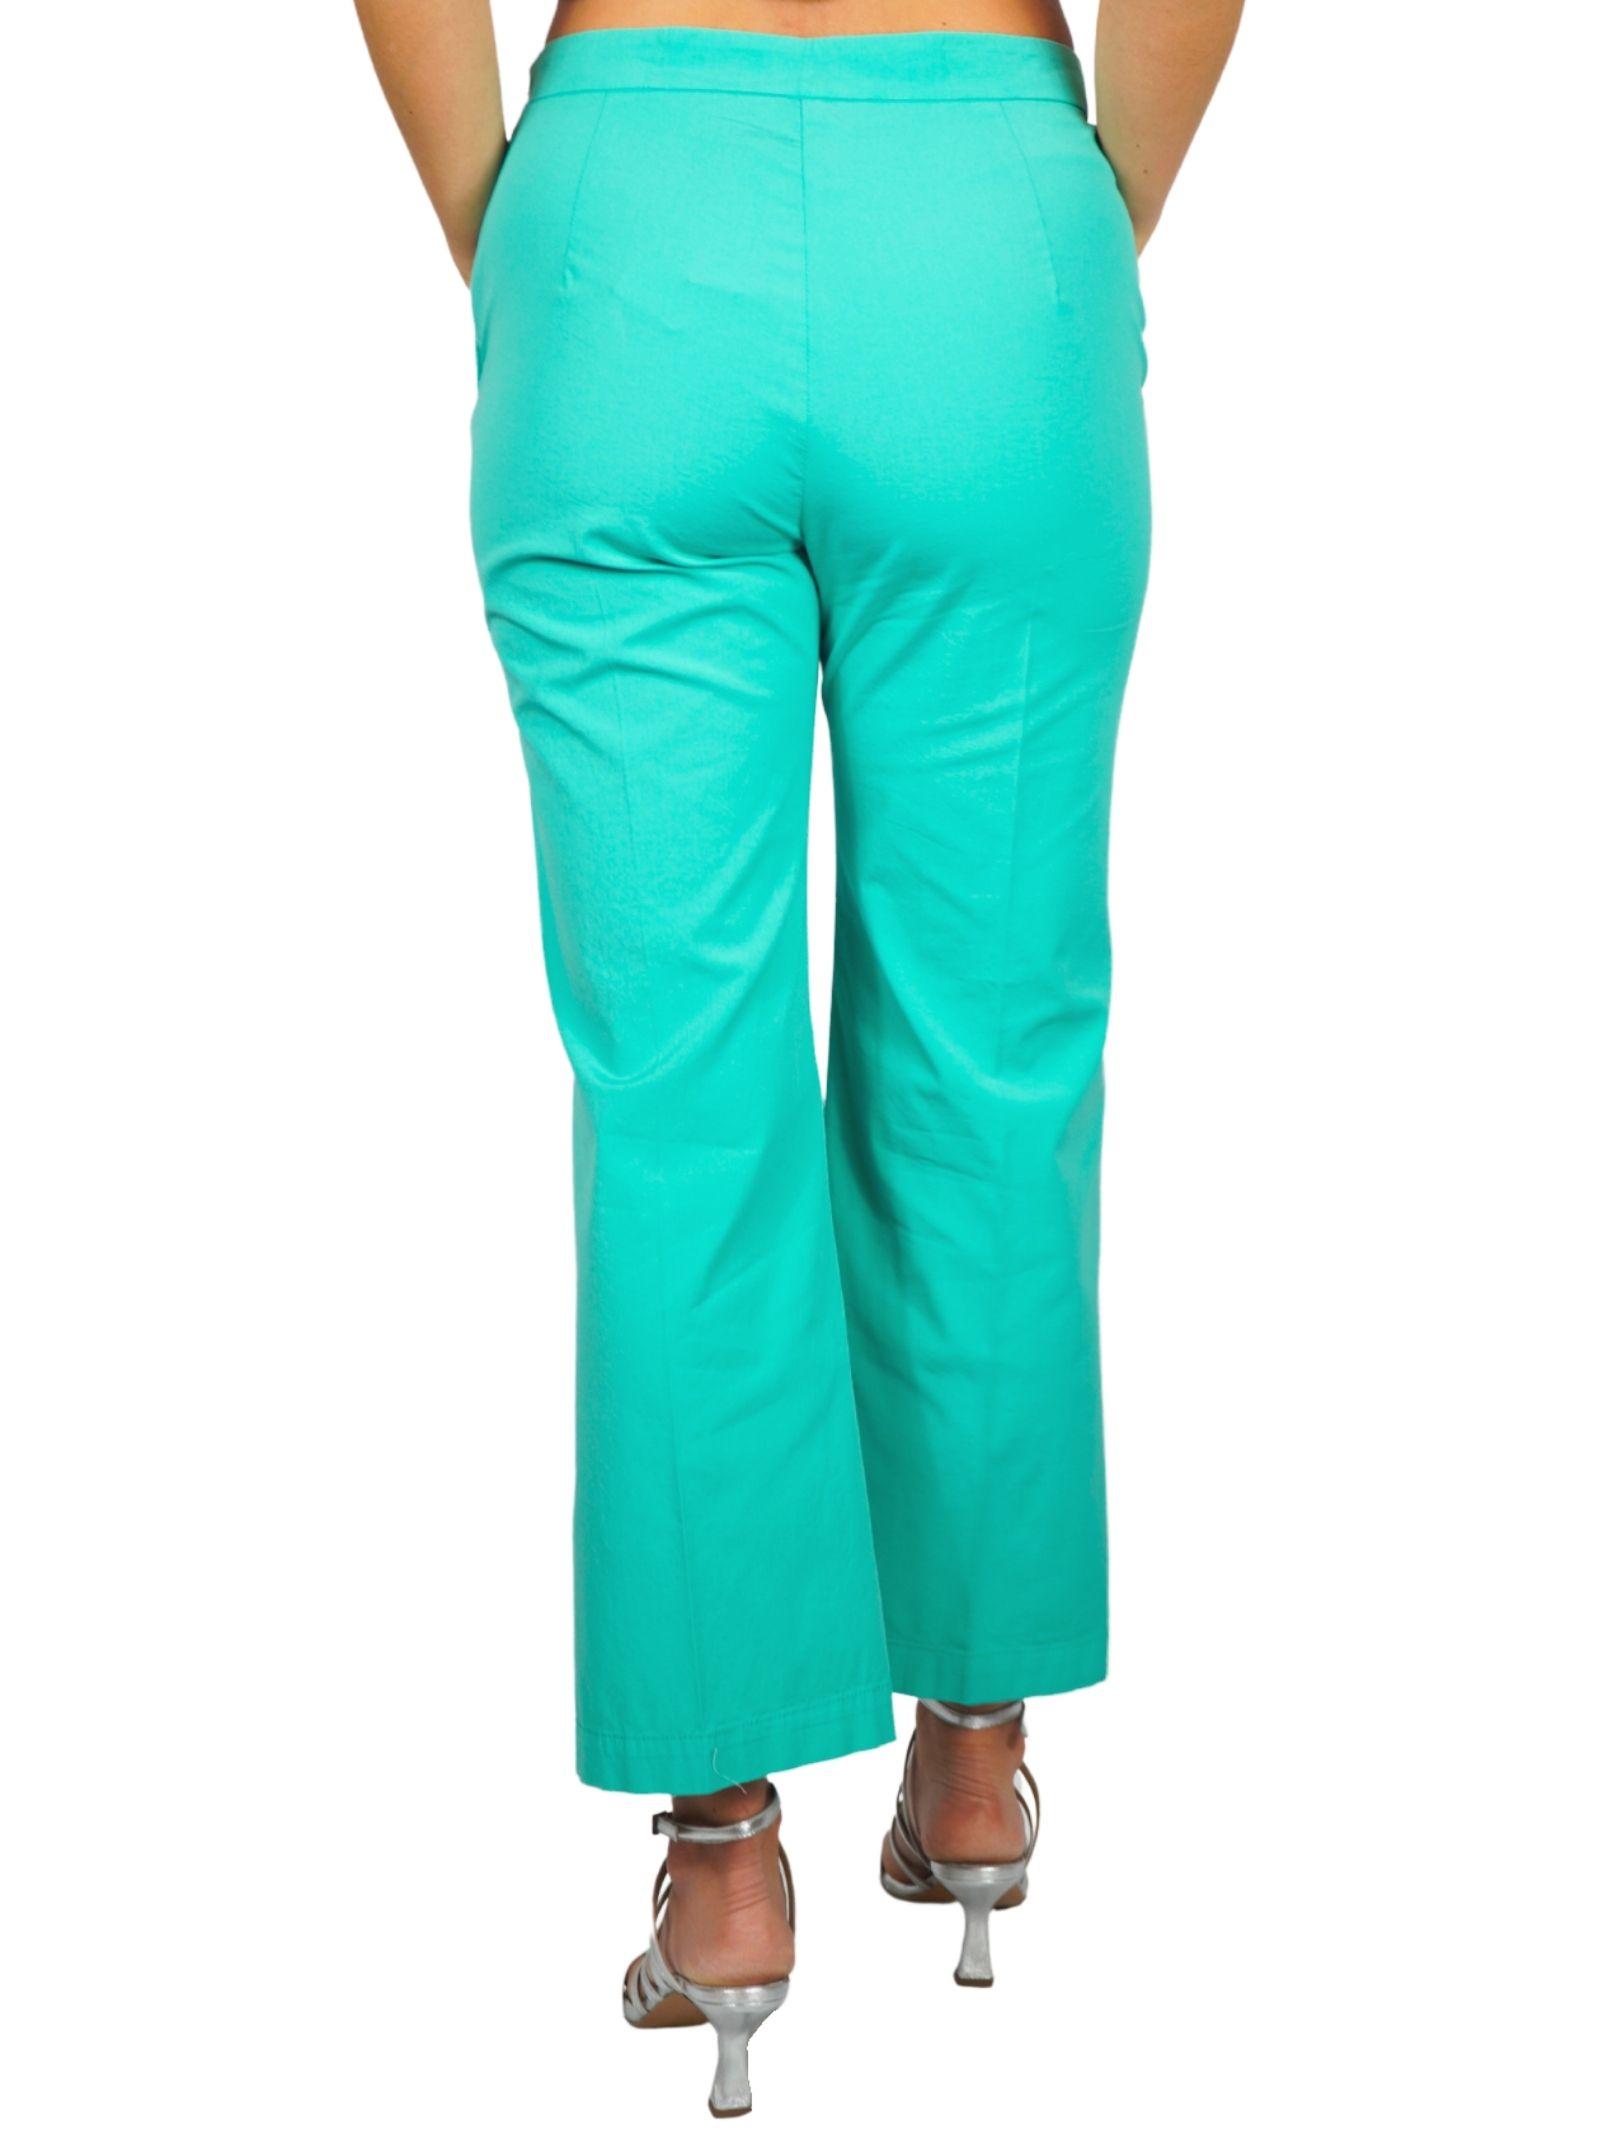 Abbigliamento Donna Pantalone Stretch Satin Cotton Turchese Maliparmi   Gonne e Pantaloni   JH71441013782012